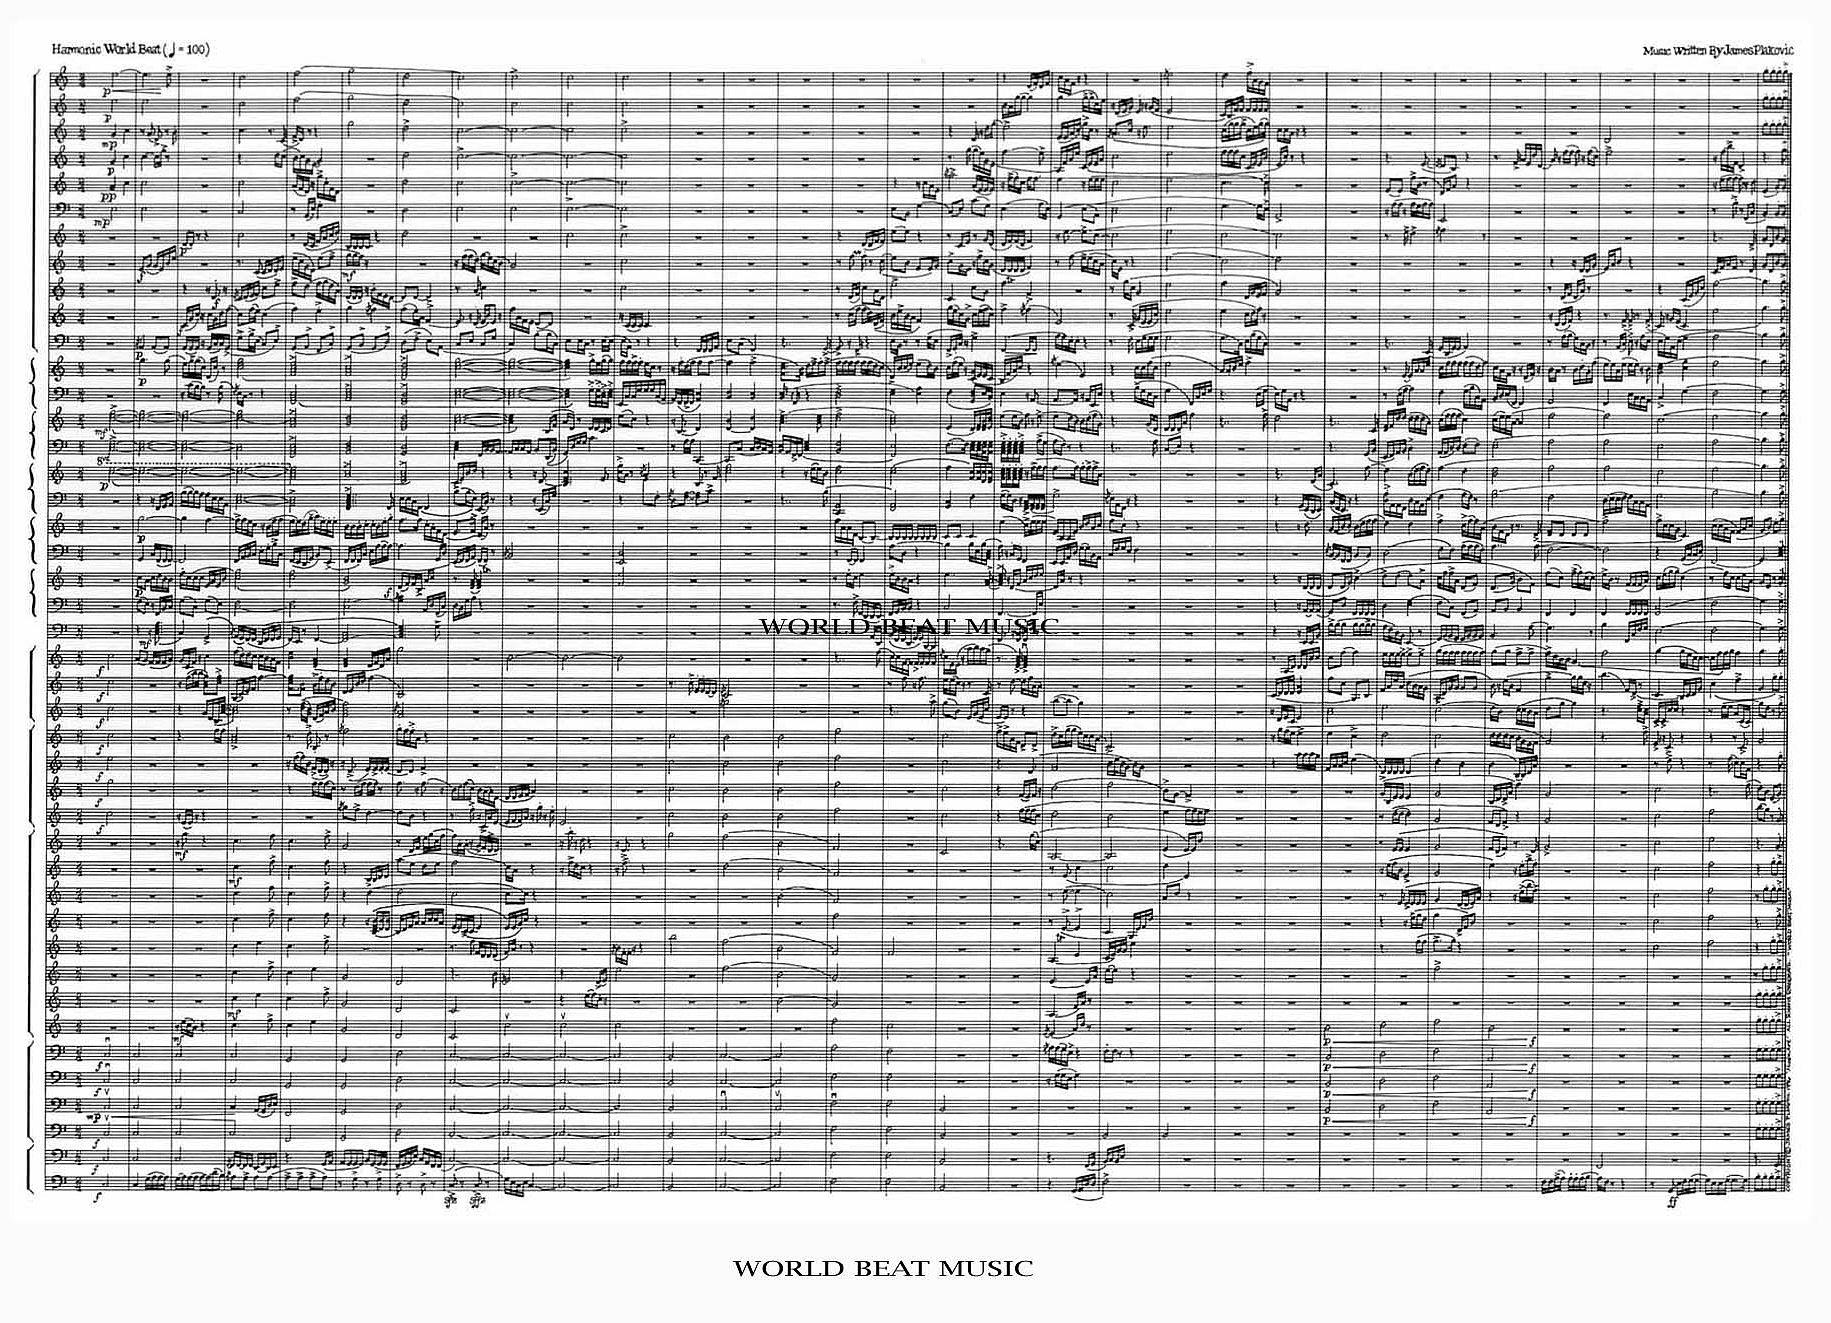 World Beat Music Map - Metsker Maps